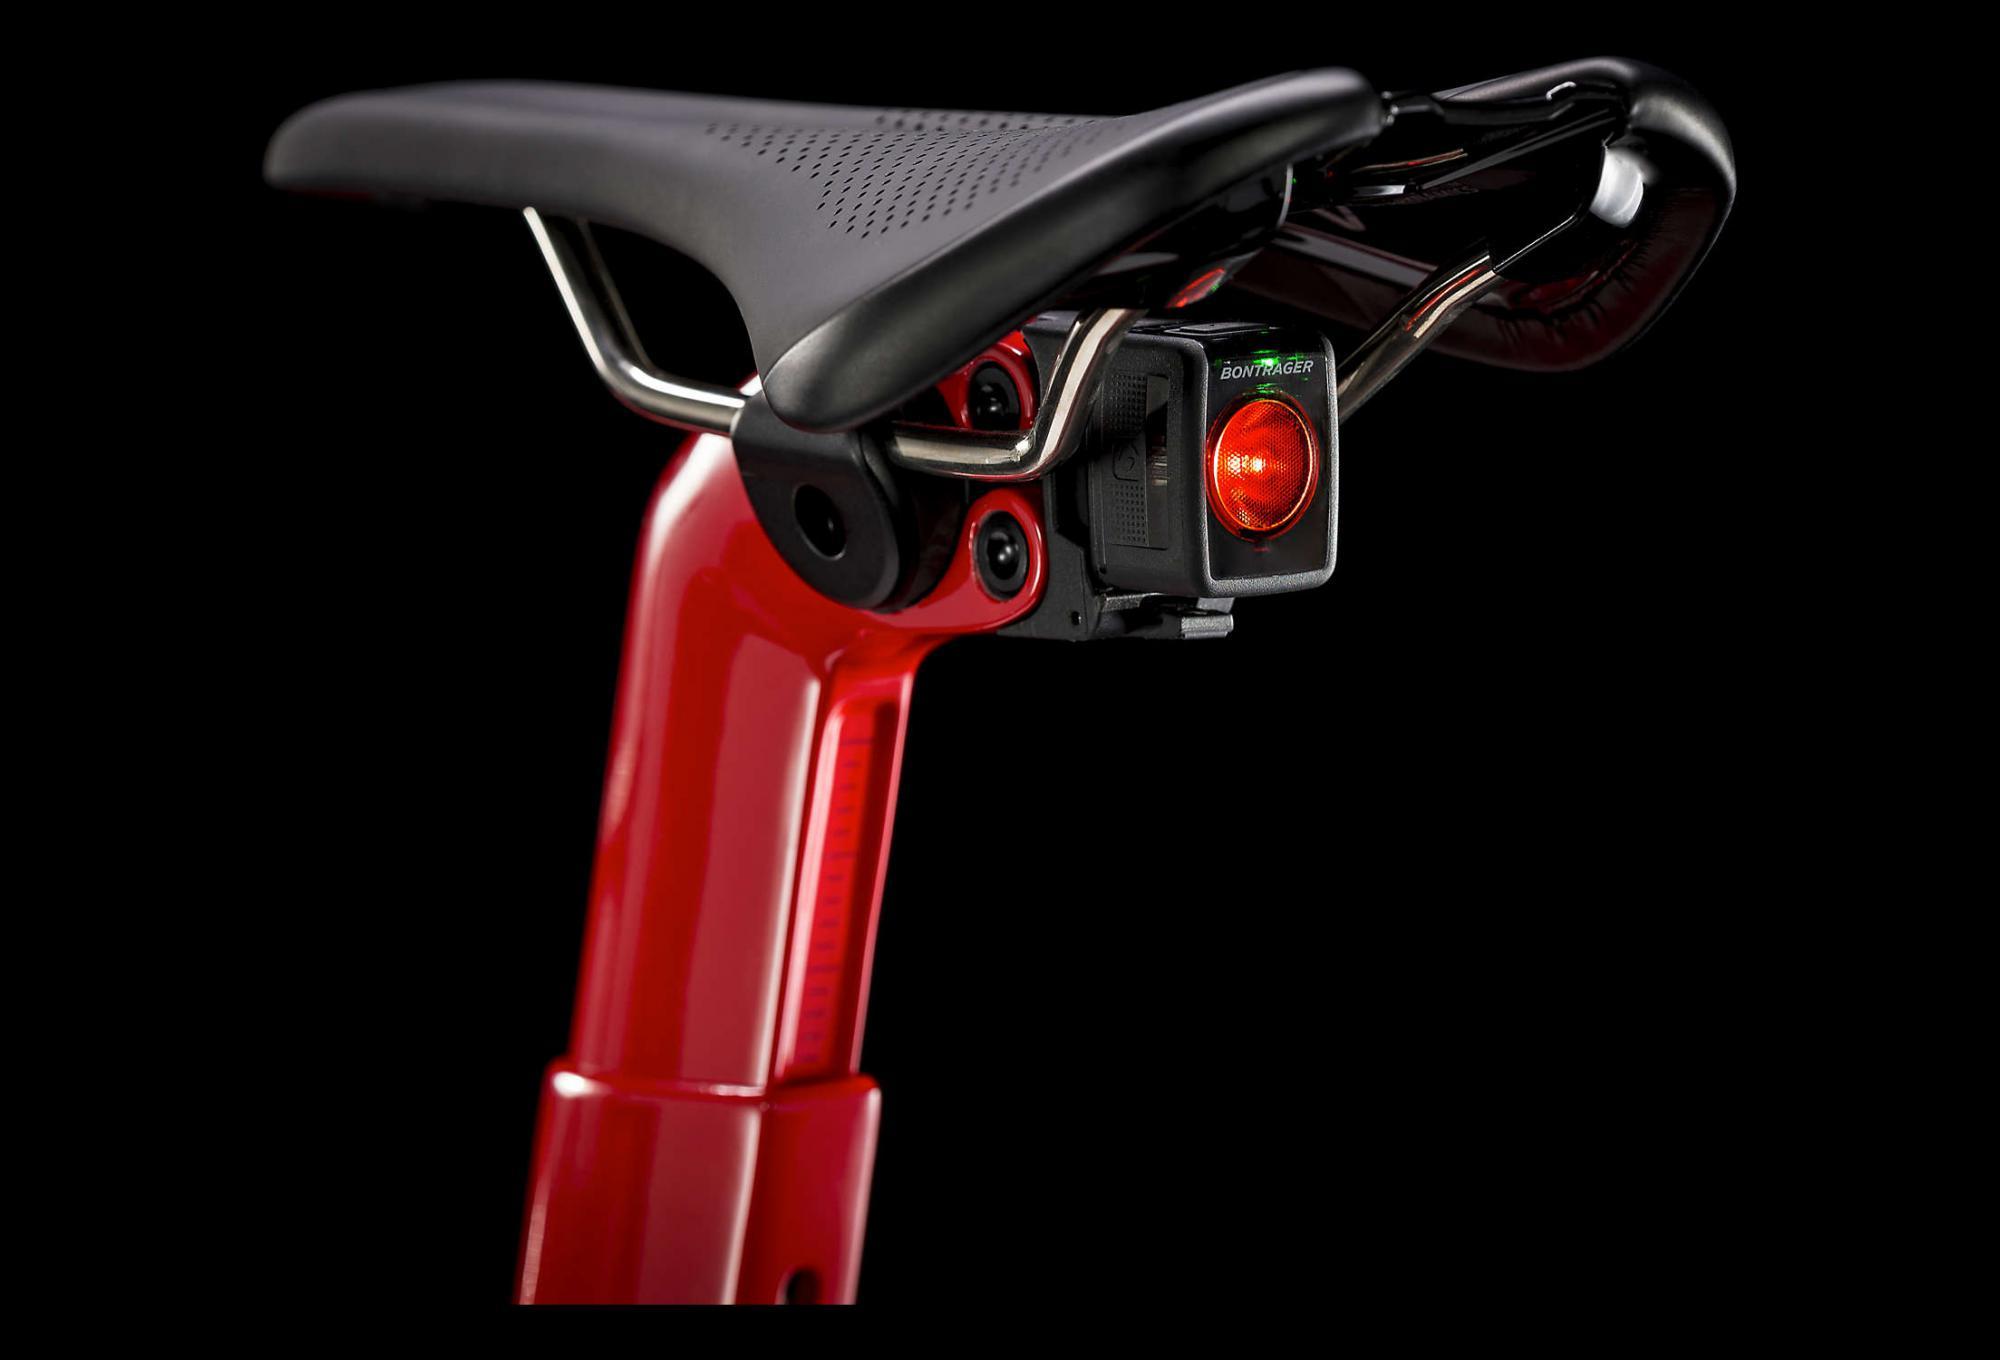 Trek Madone SLR CYCLIQ seatpost mount